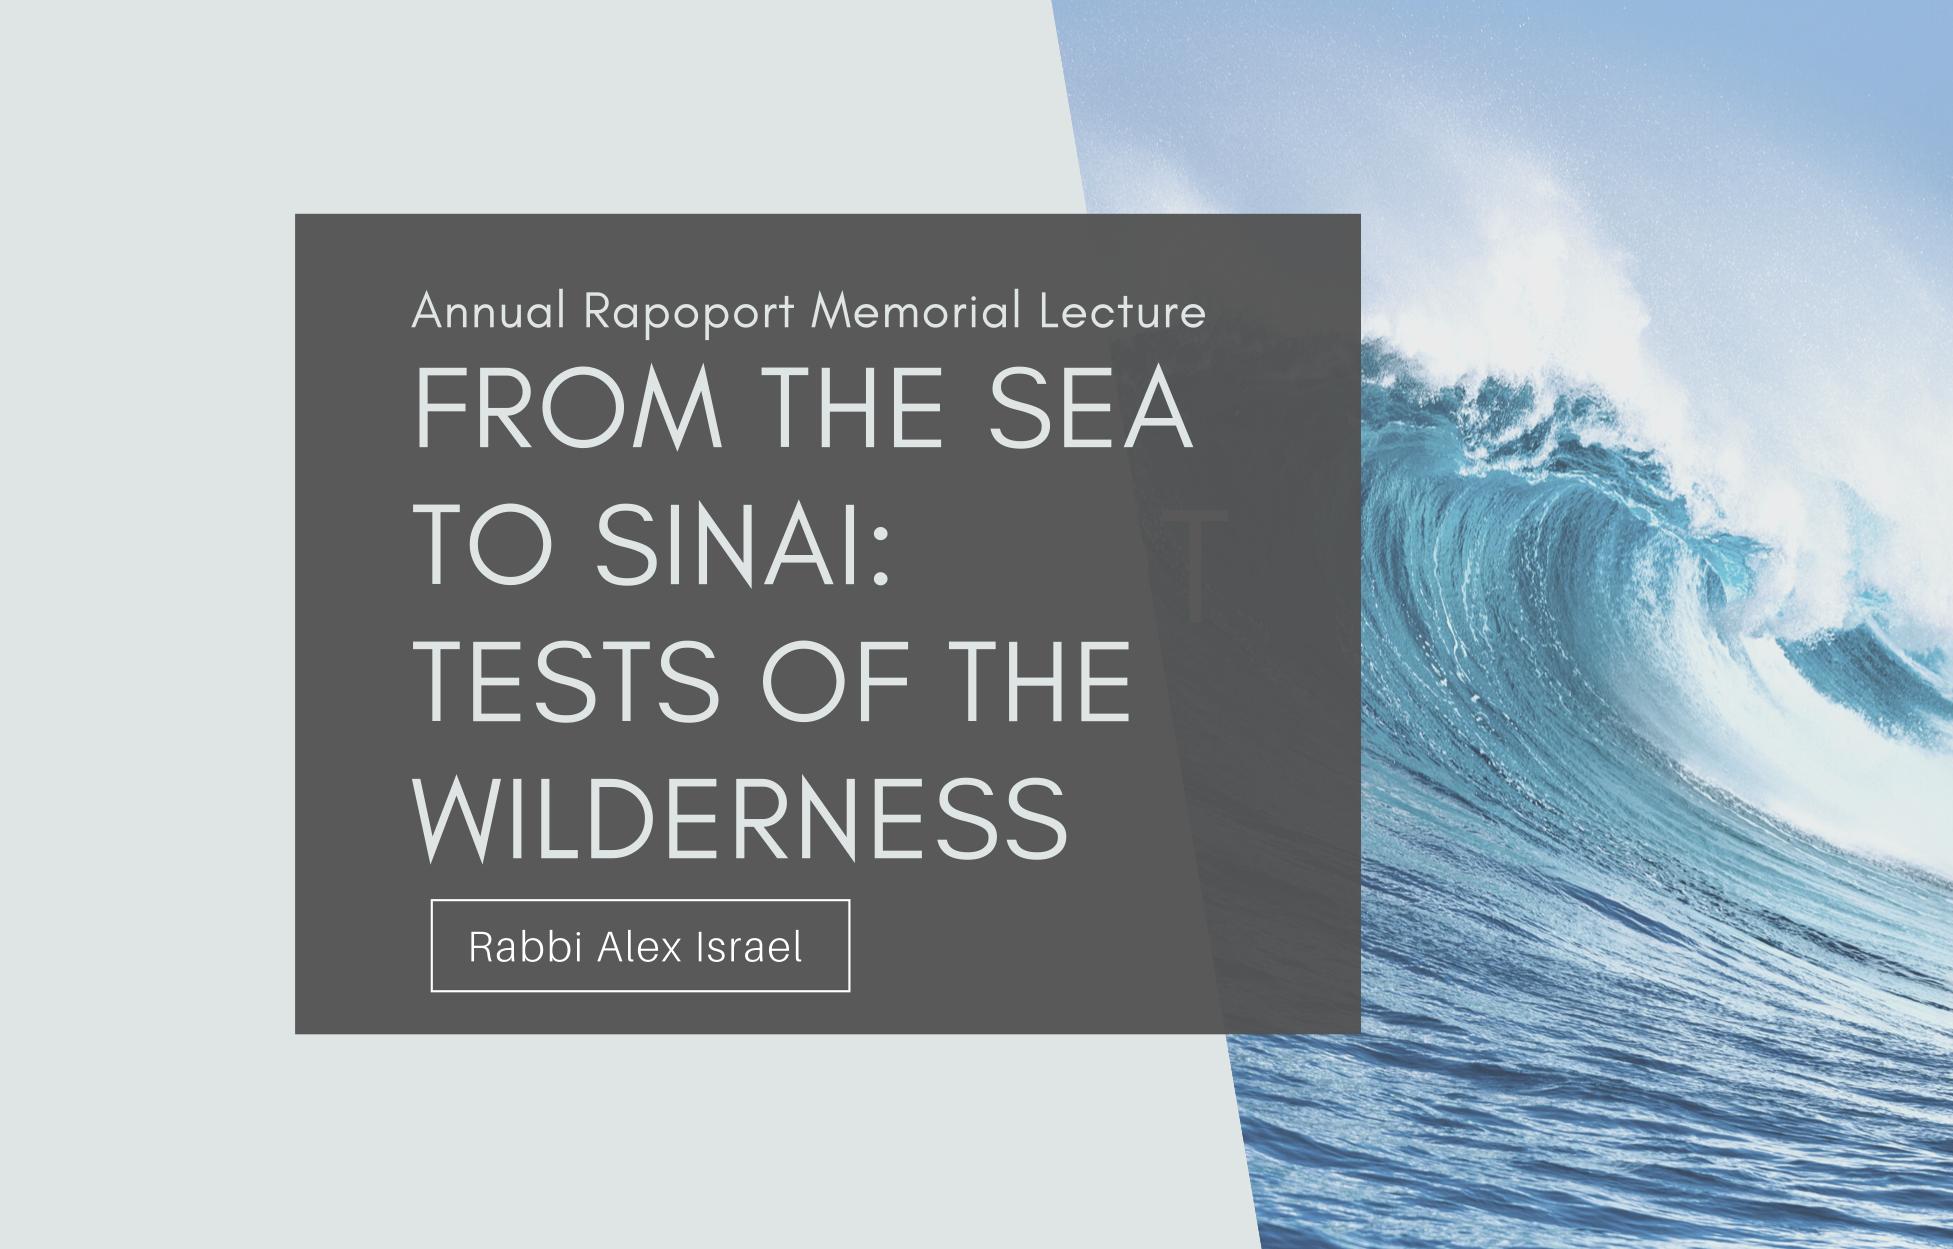 Annual Rapoport Memorial Lecture